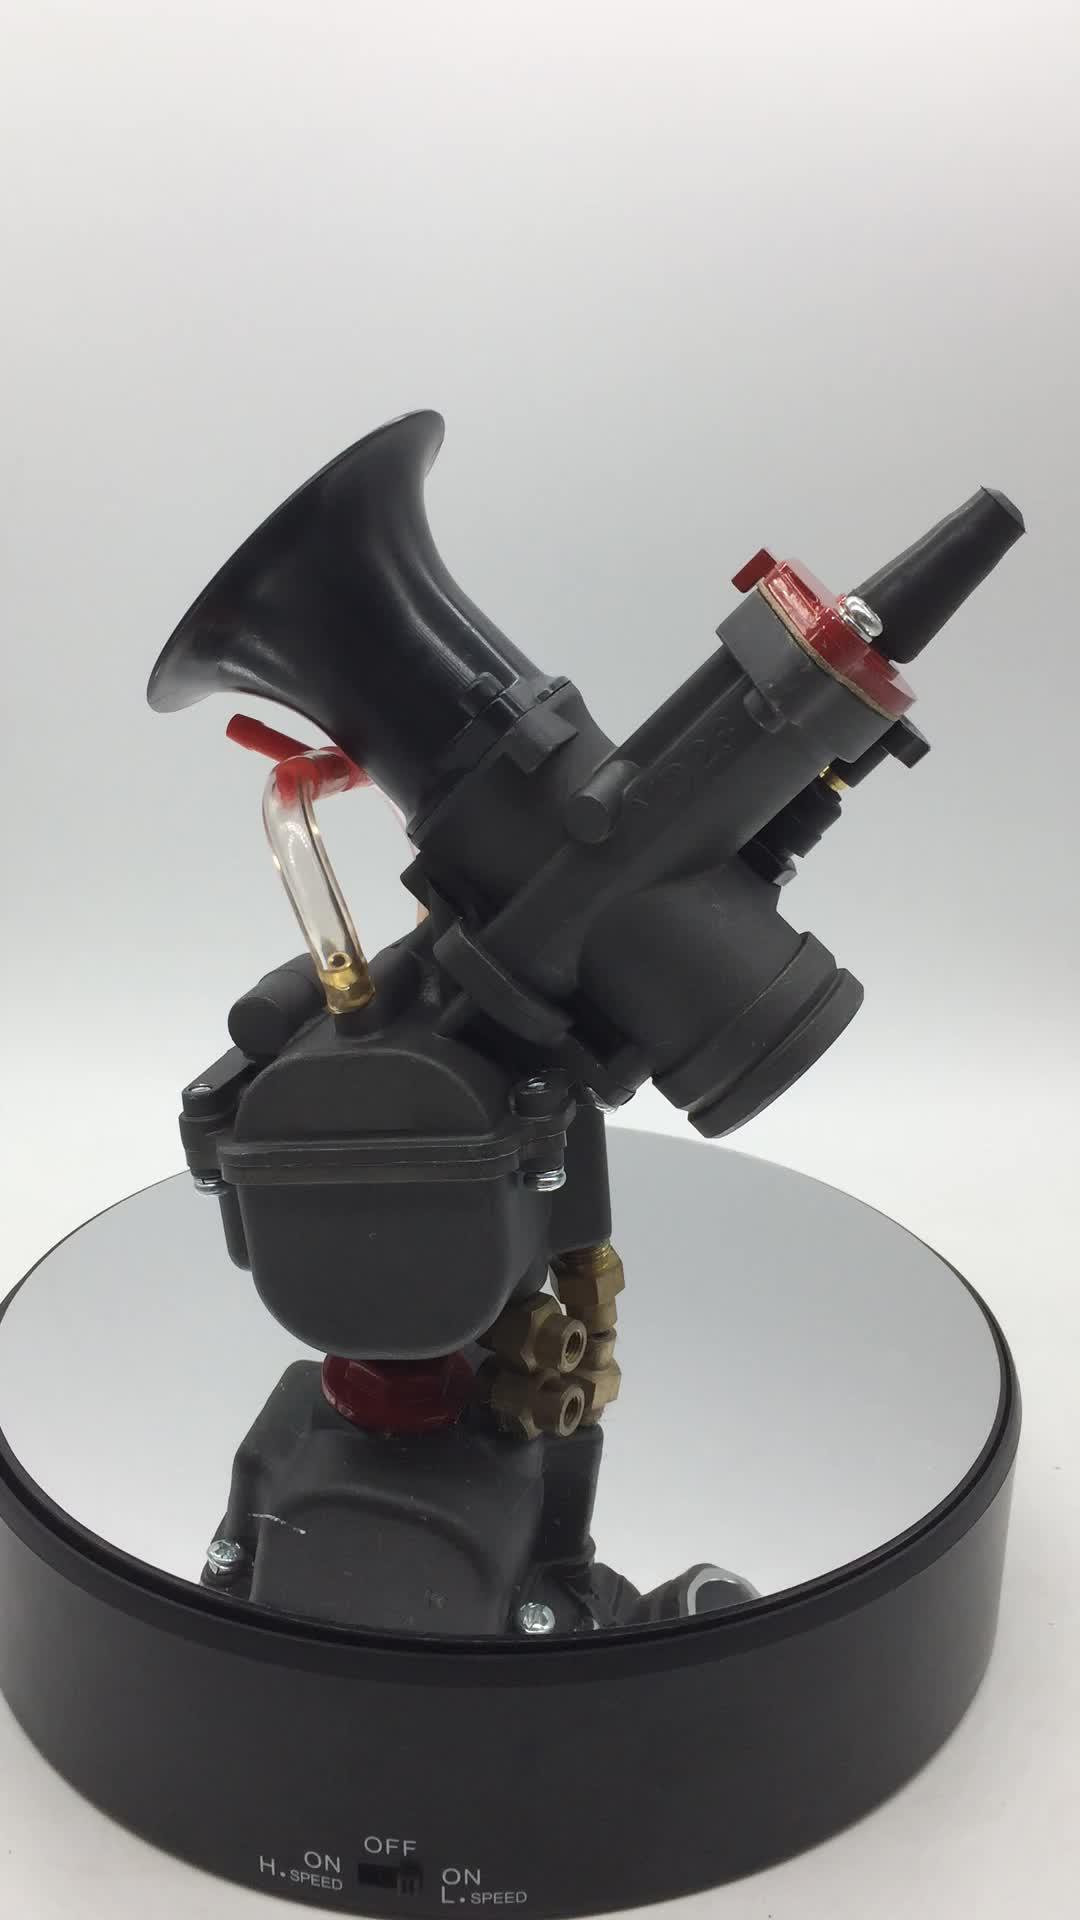 Mjn China: Yoshimura Yd-mjn28 Dual Stack Carburettor Carburetor Power